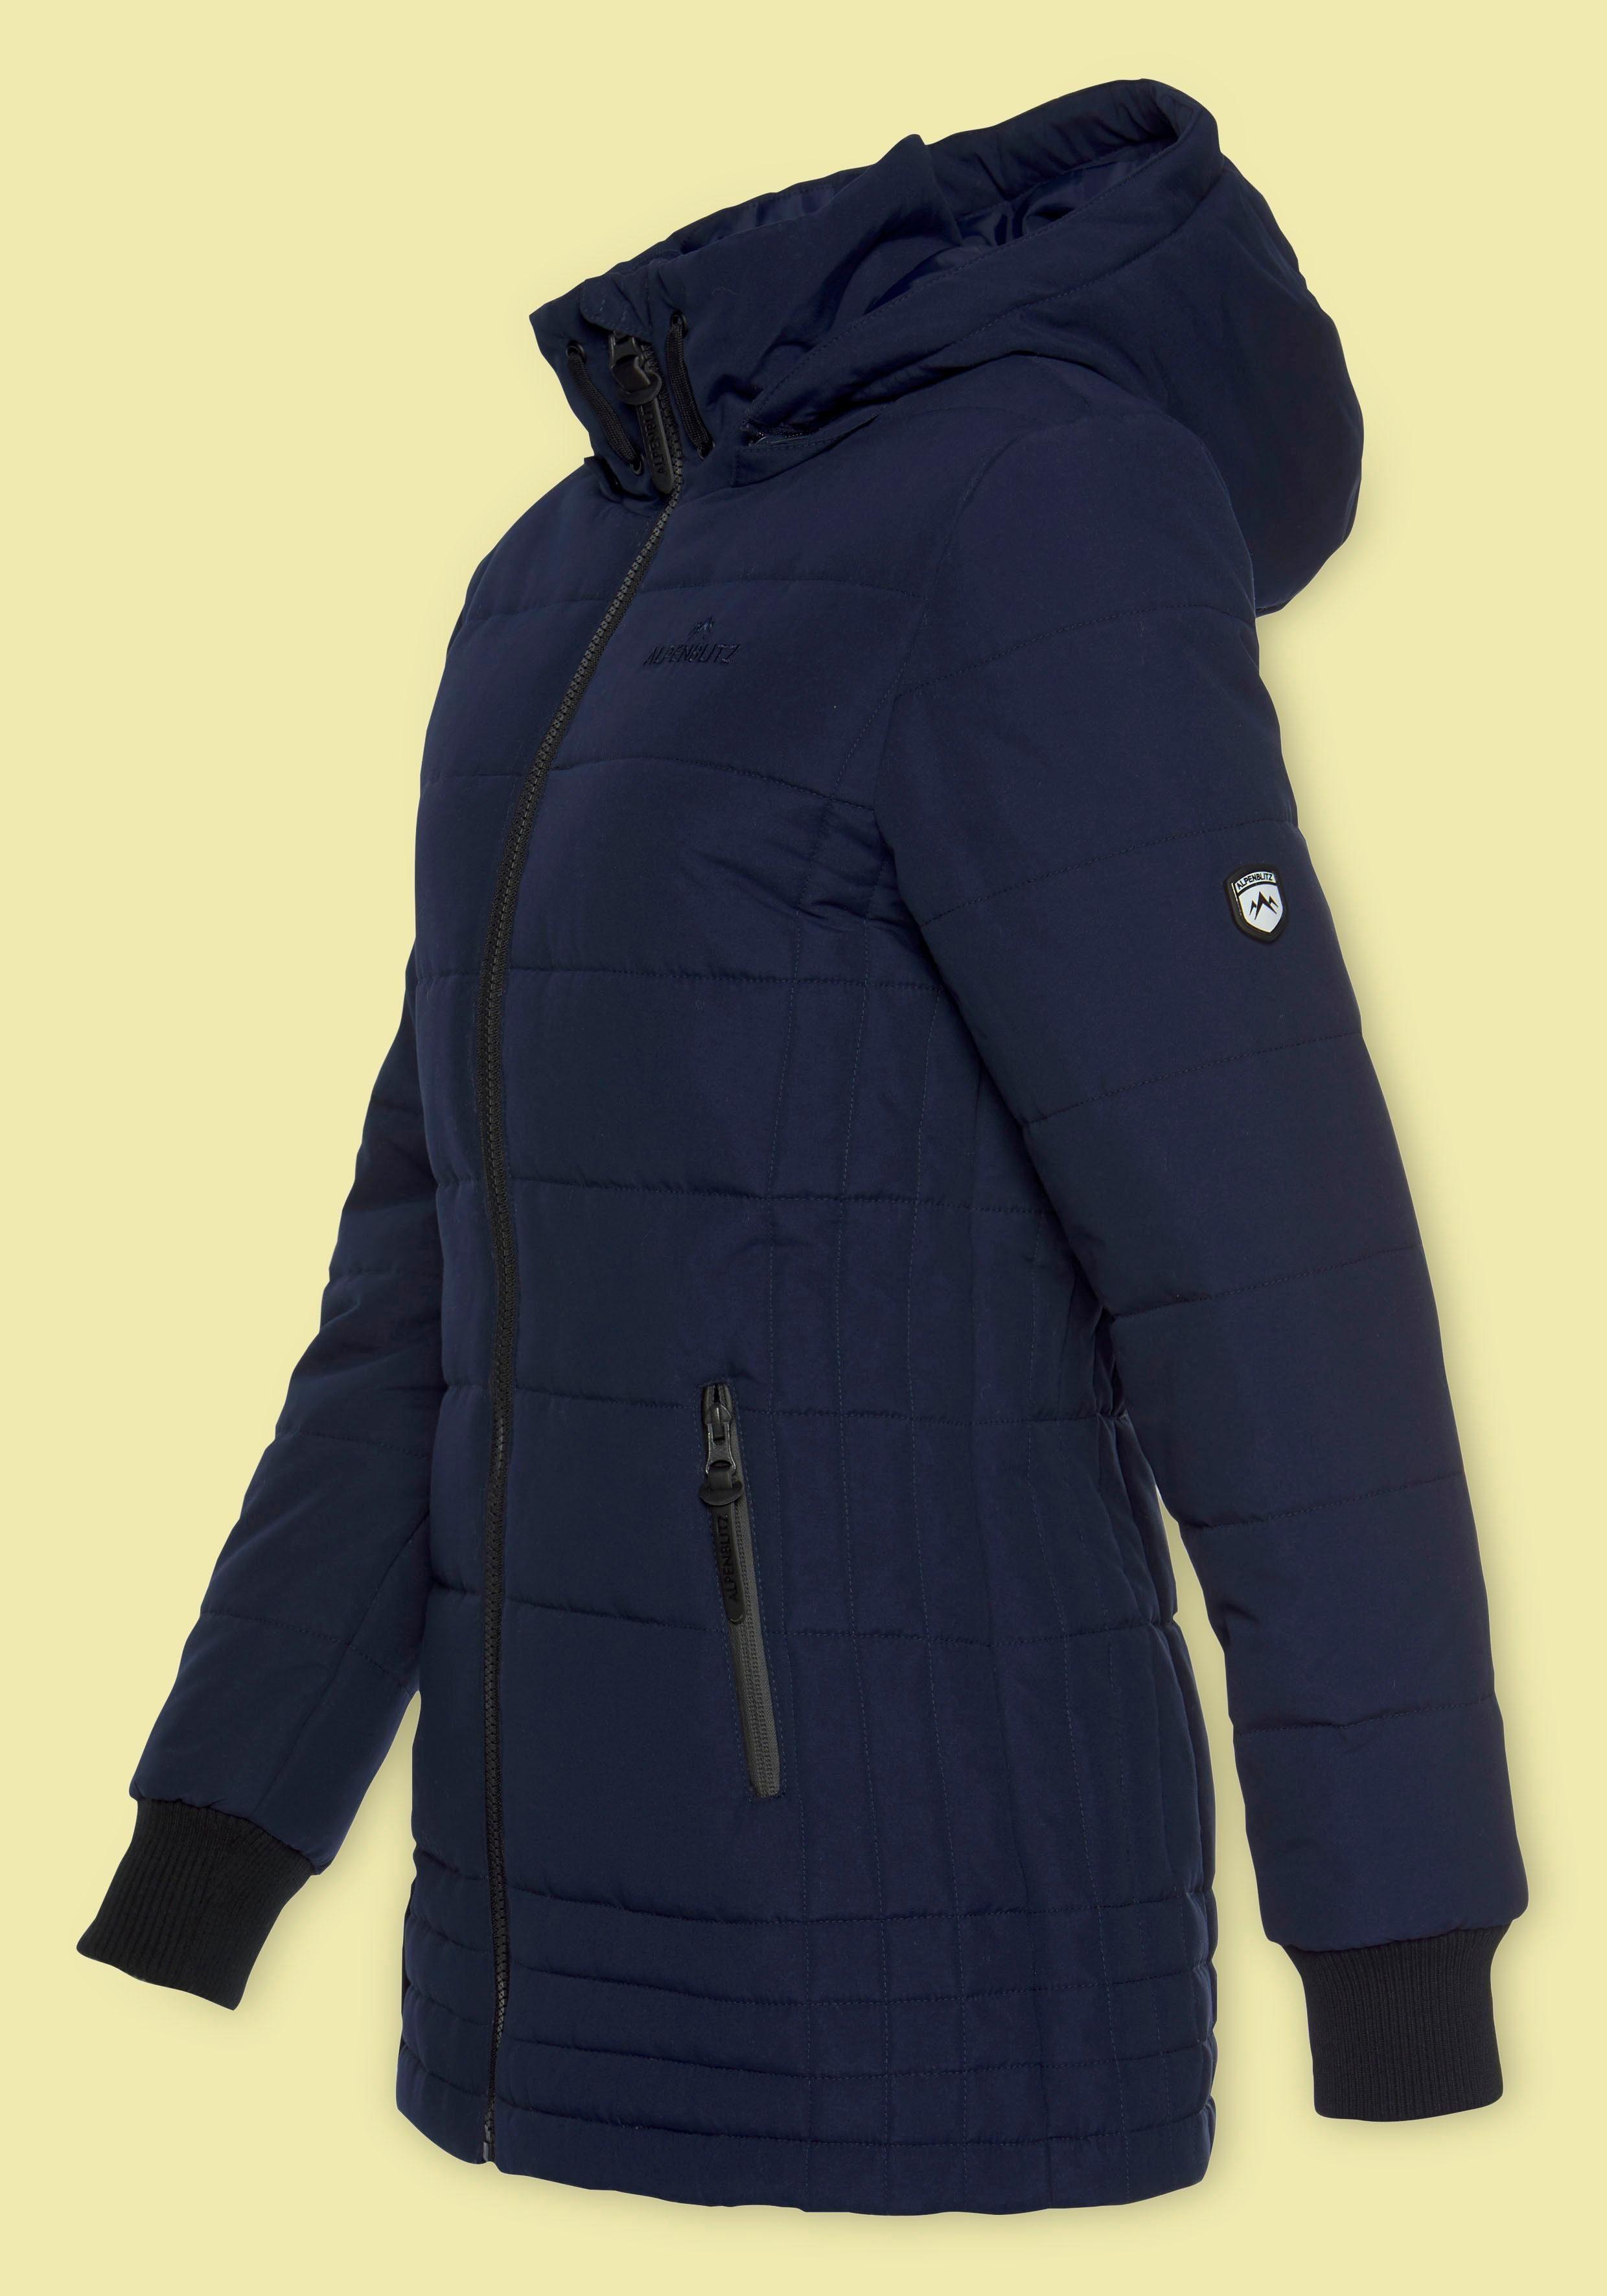 ALPENBLITZ Steppjacke »Flockenwirbel« moderne Winterjacke mit abnehmbarer Kapuze